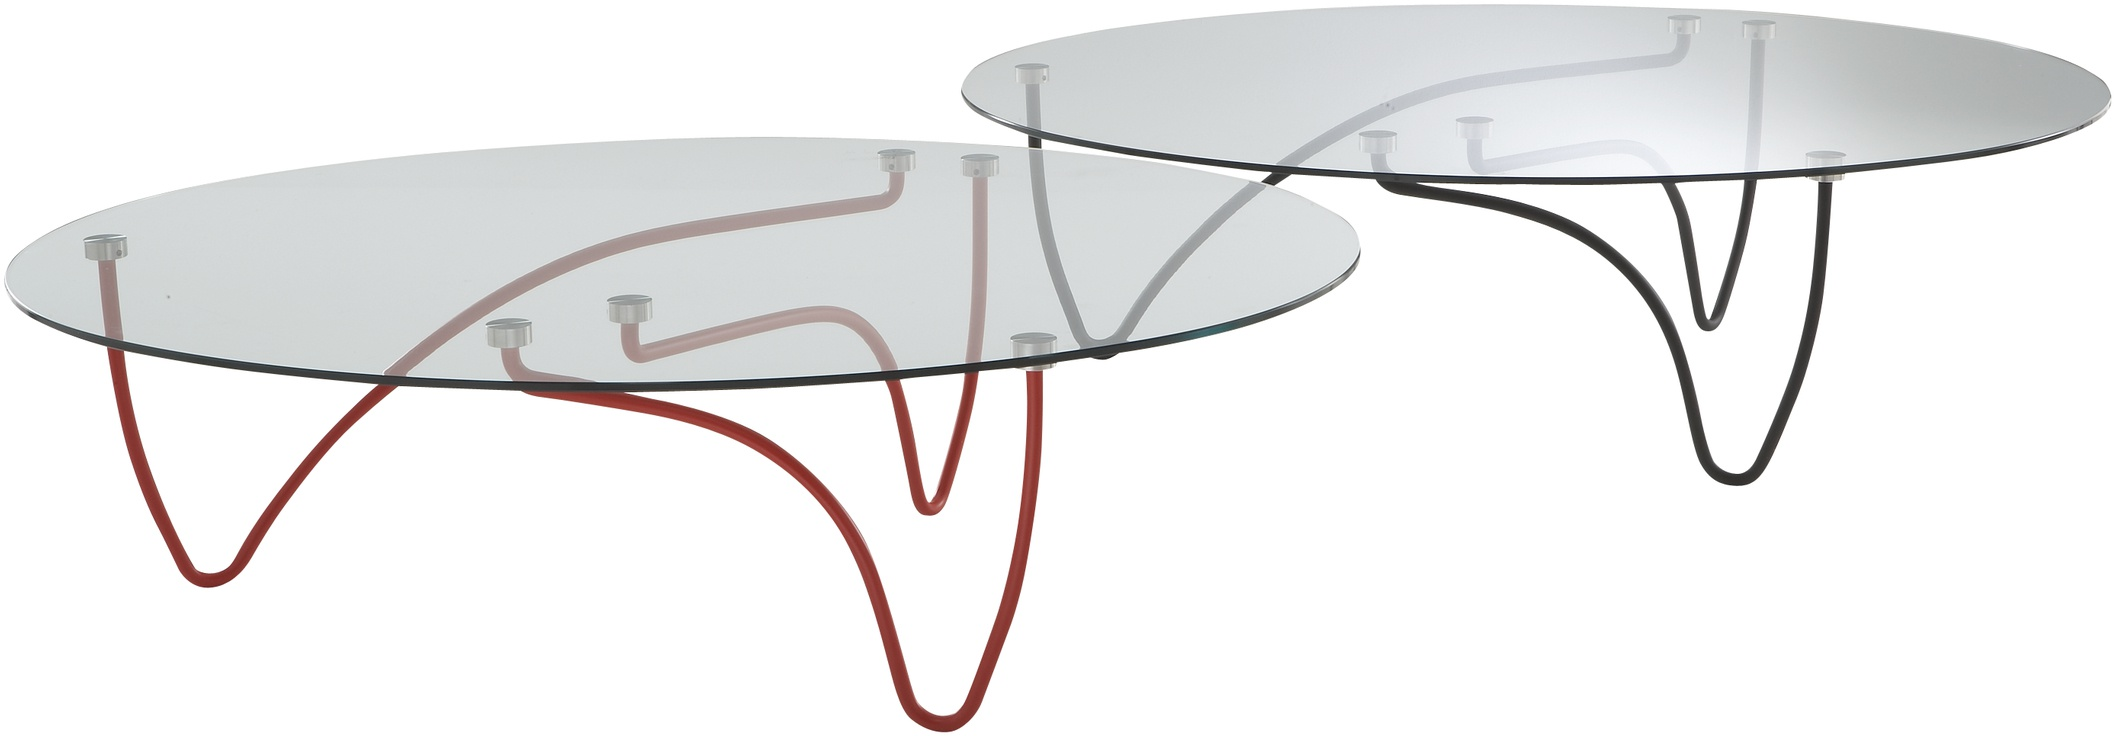 Table Basse Fer Maison Du Monde ~ Rythme, Tables Basses Designer  Angie Anakis  Ligne Roset